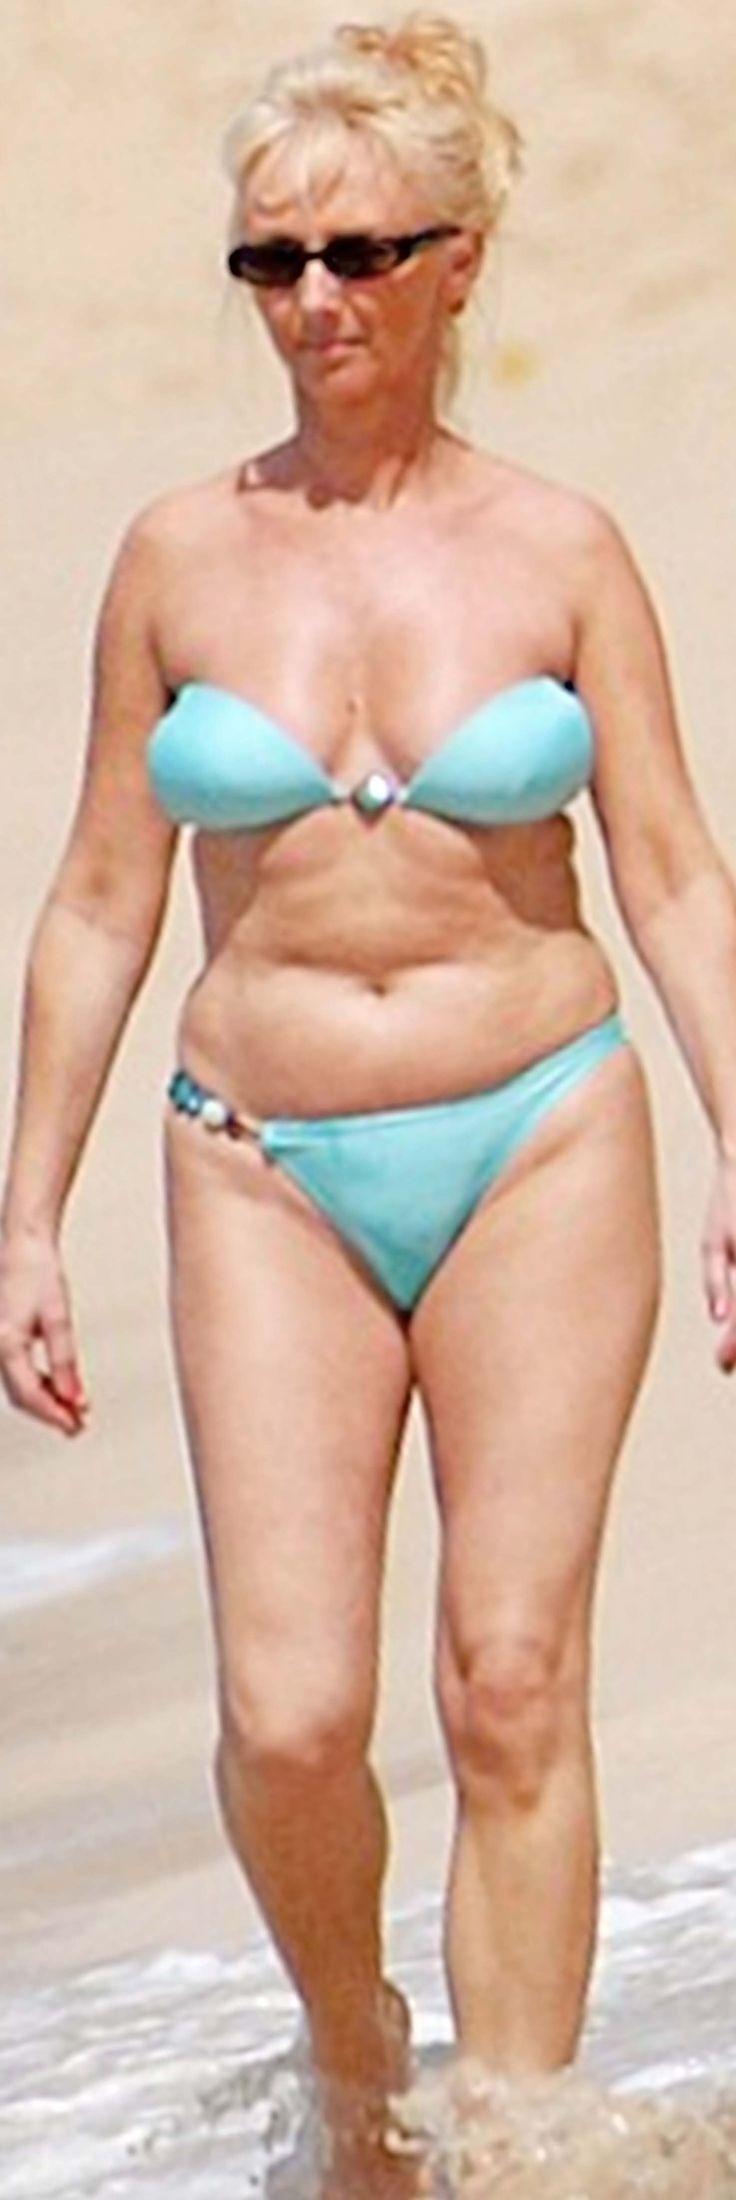 Mature women in bikinis love